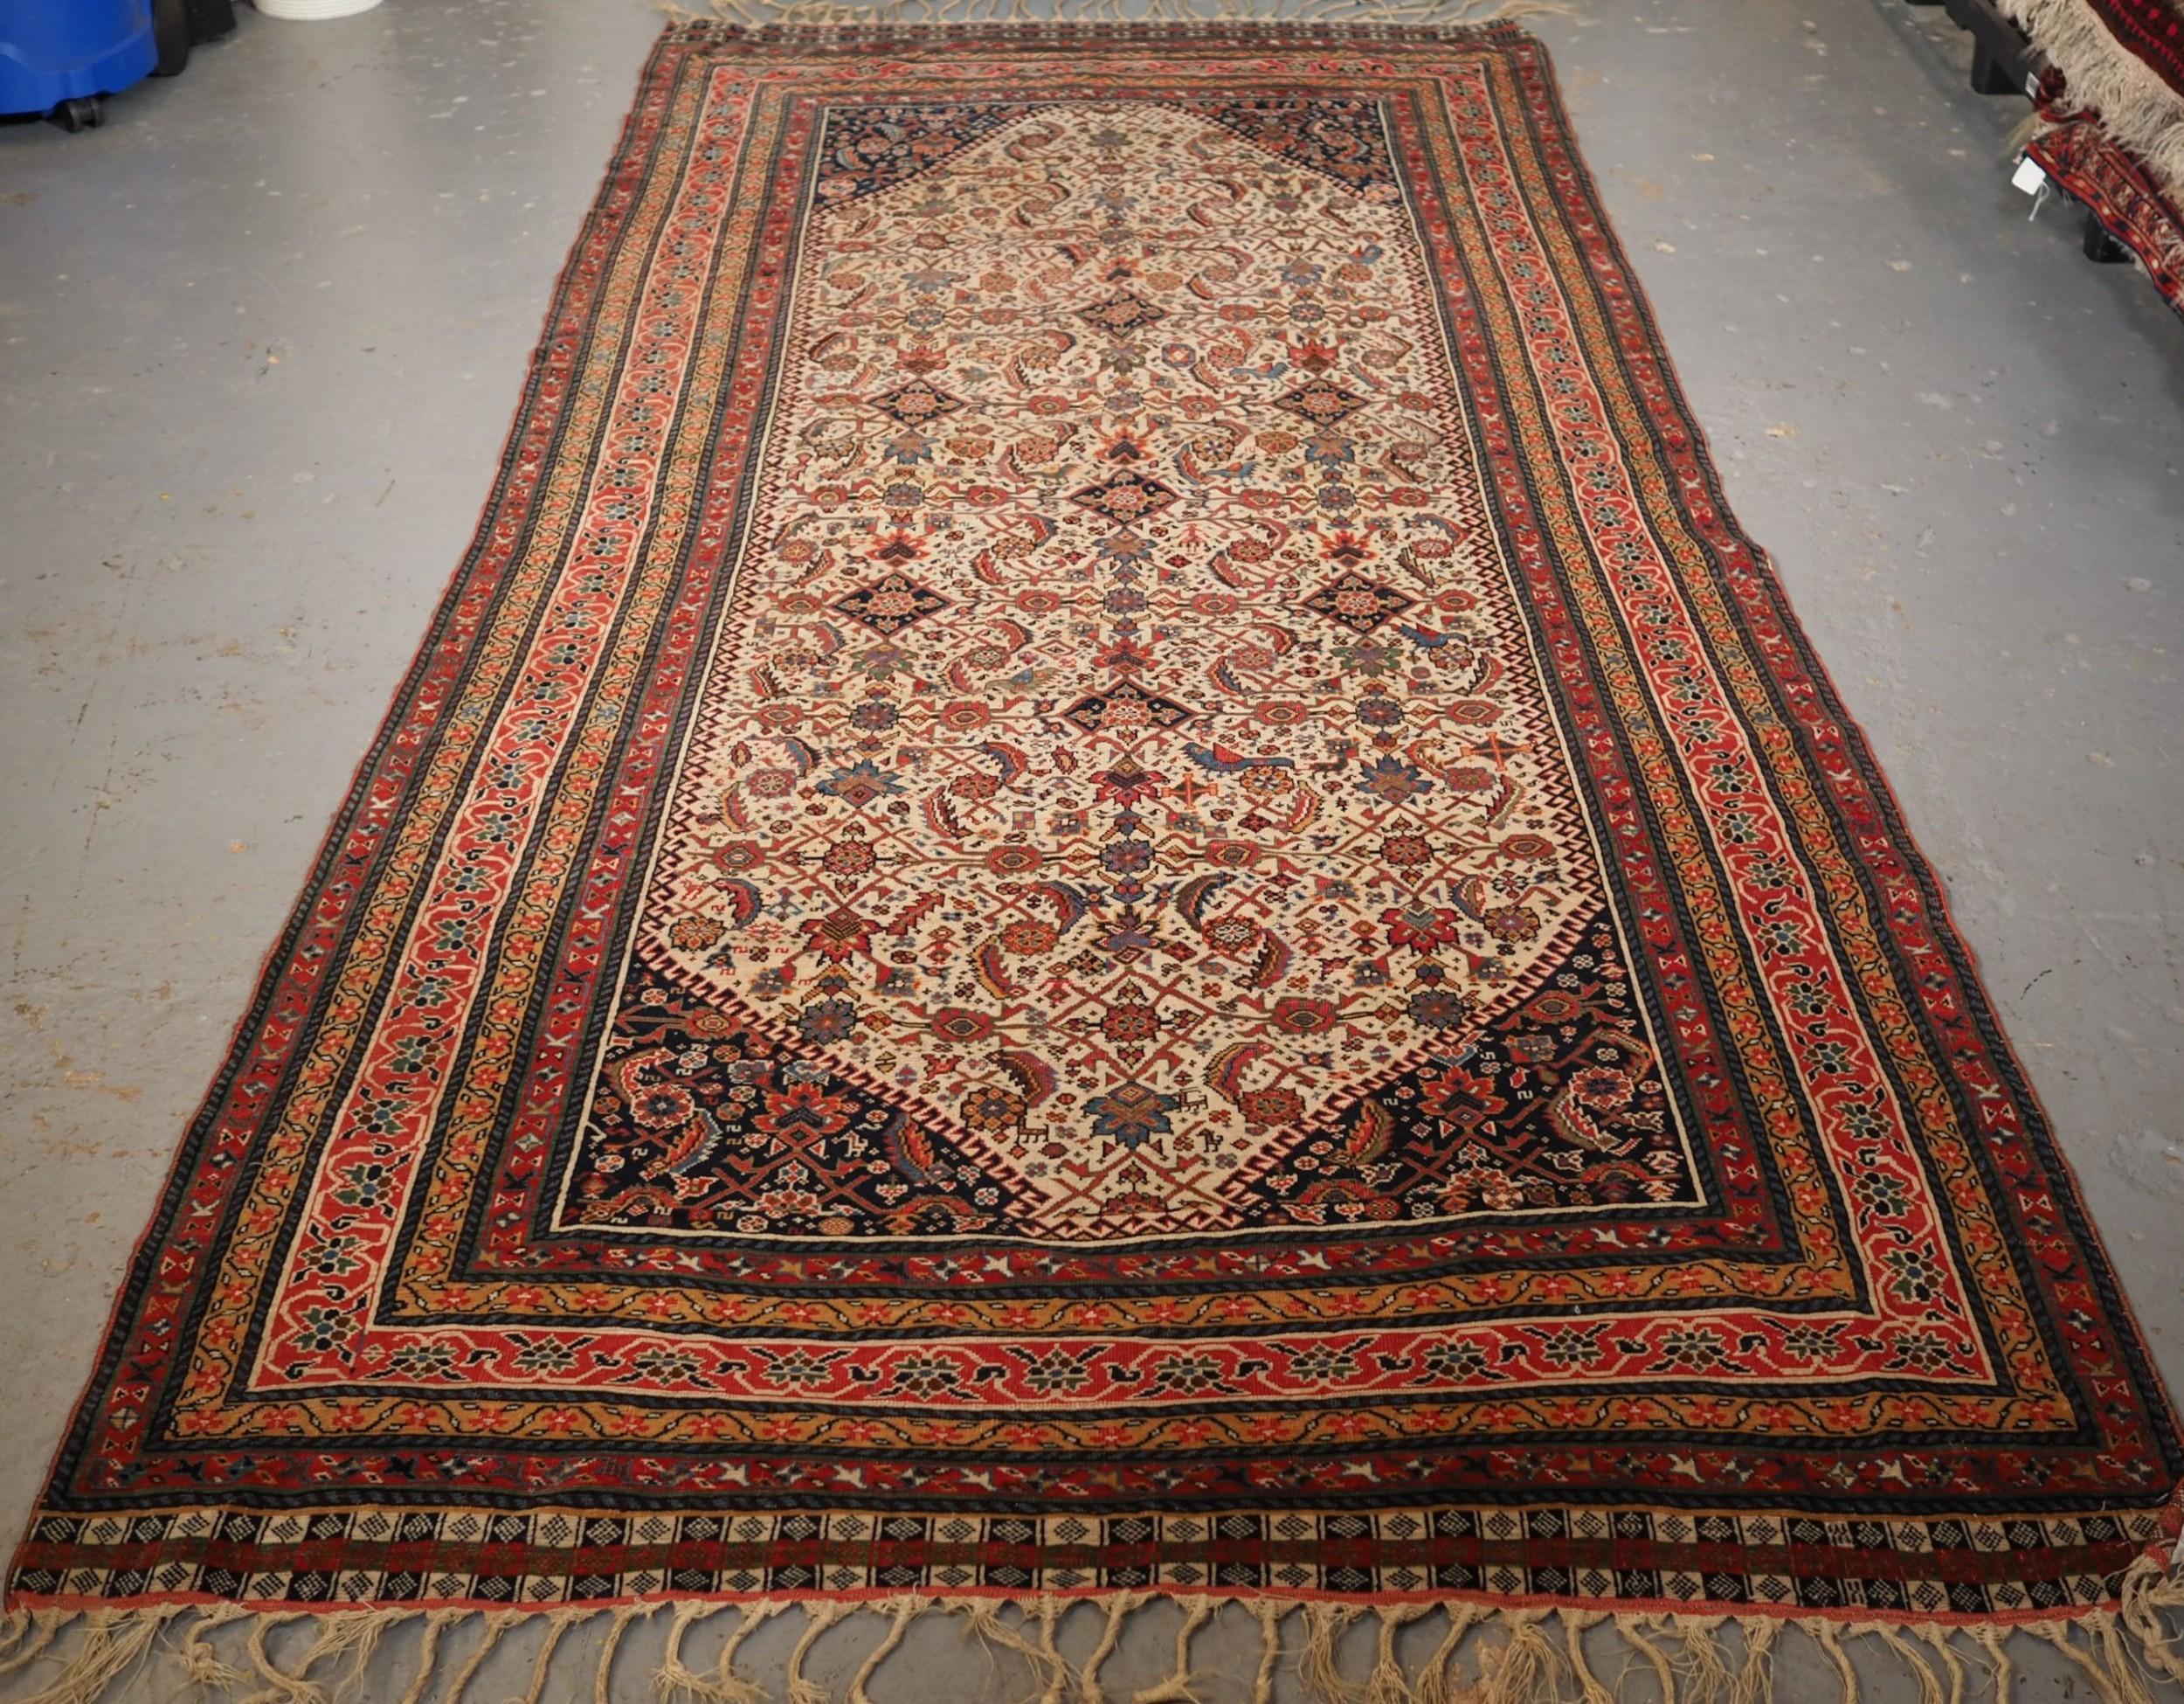 antique qashqai long rug ivory ground herati design with tibal elements circa 1870